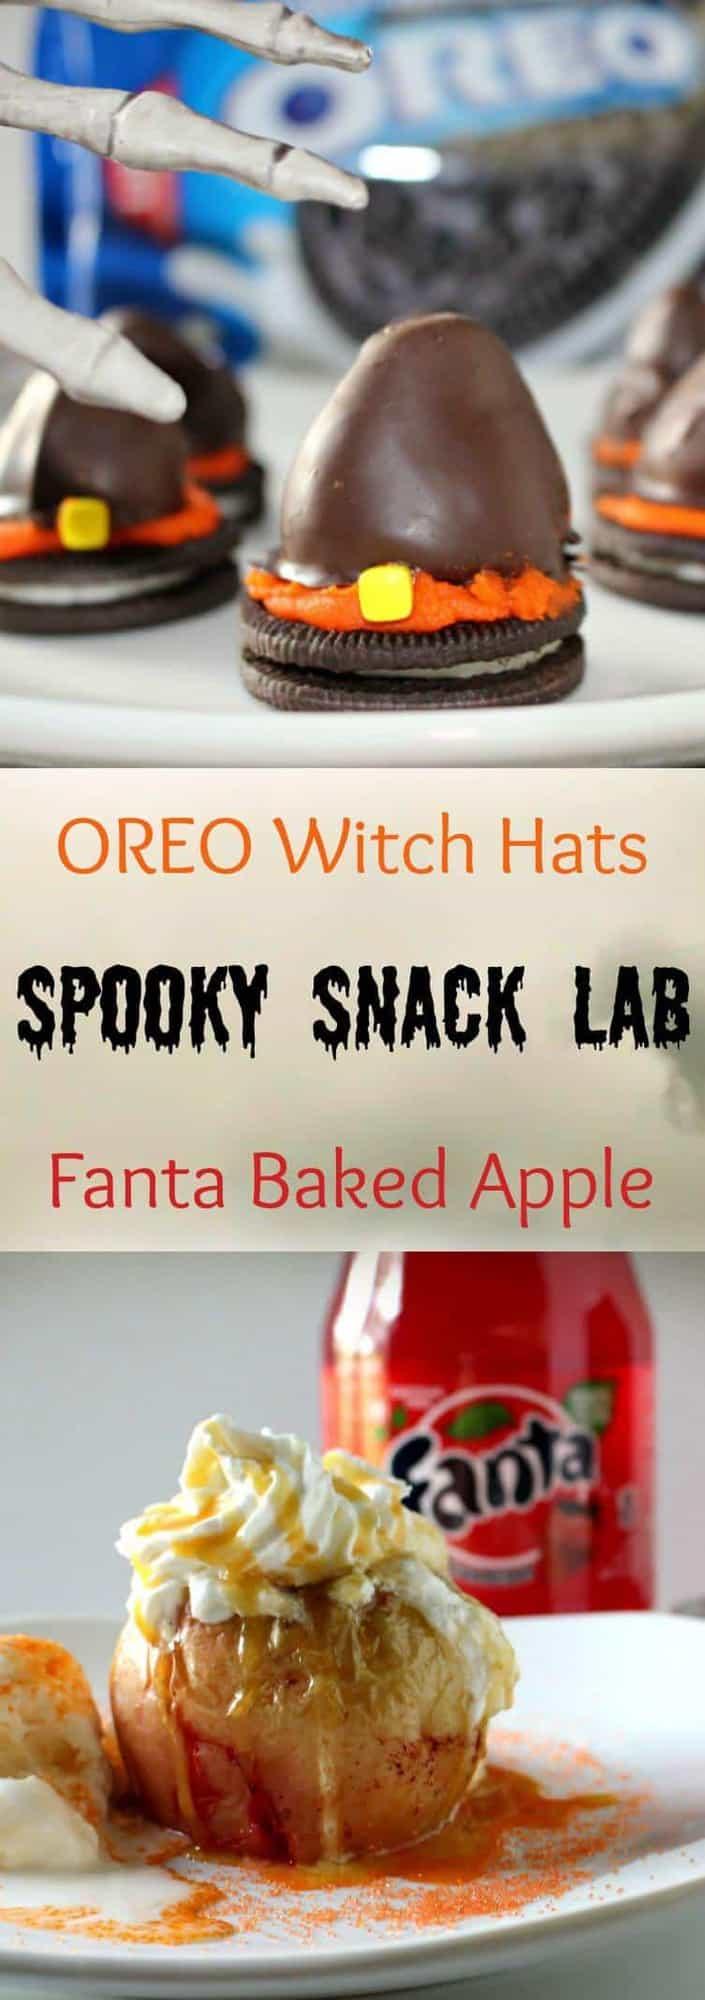 Spooky Snack Lab Halloween Treats #SpookySnackLab #IWorkWithCoke